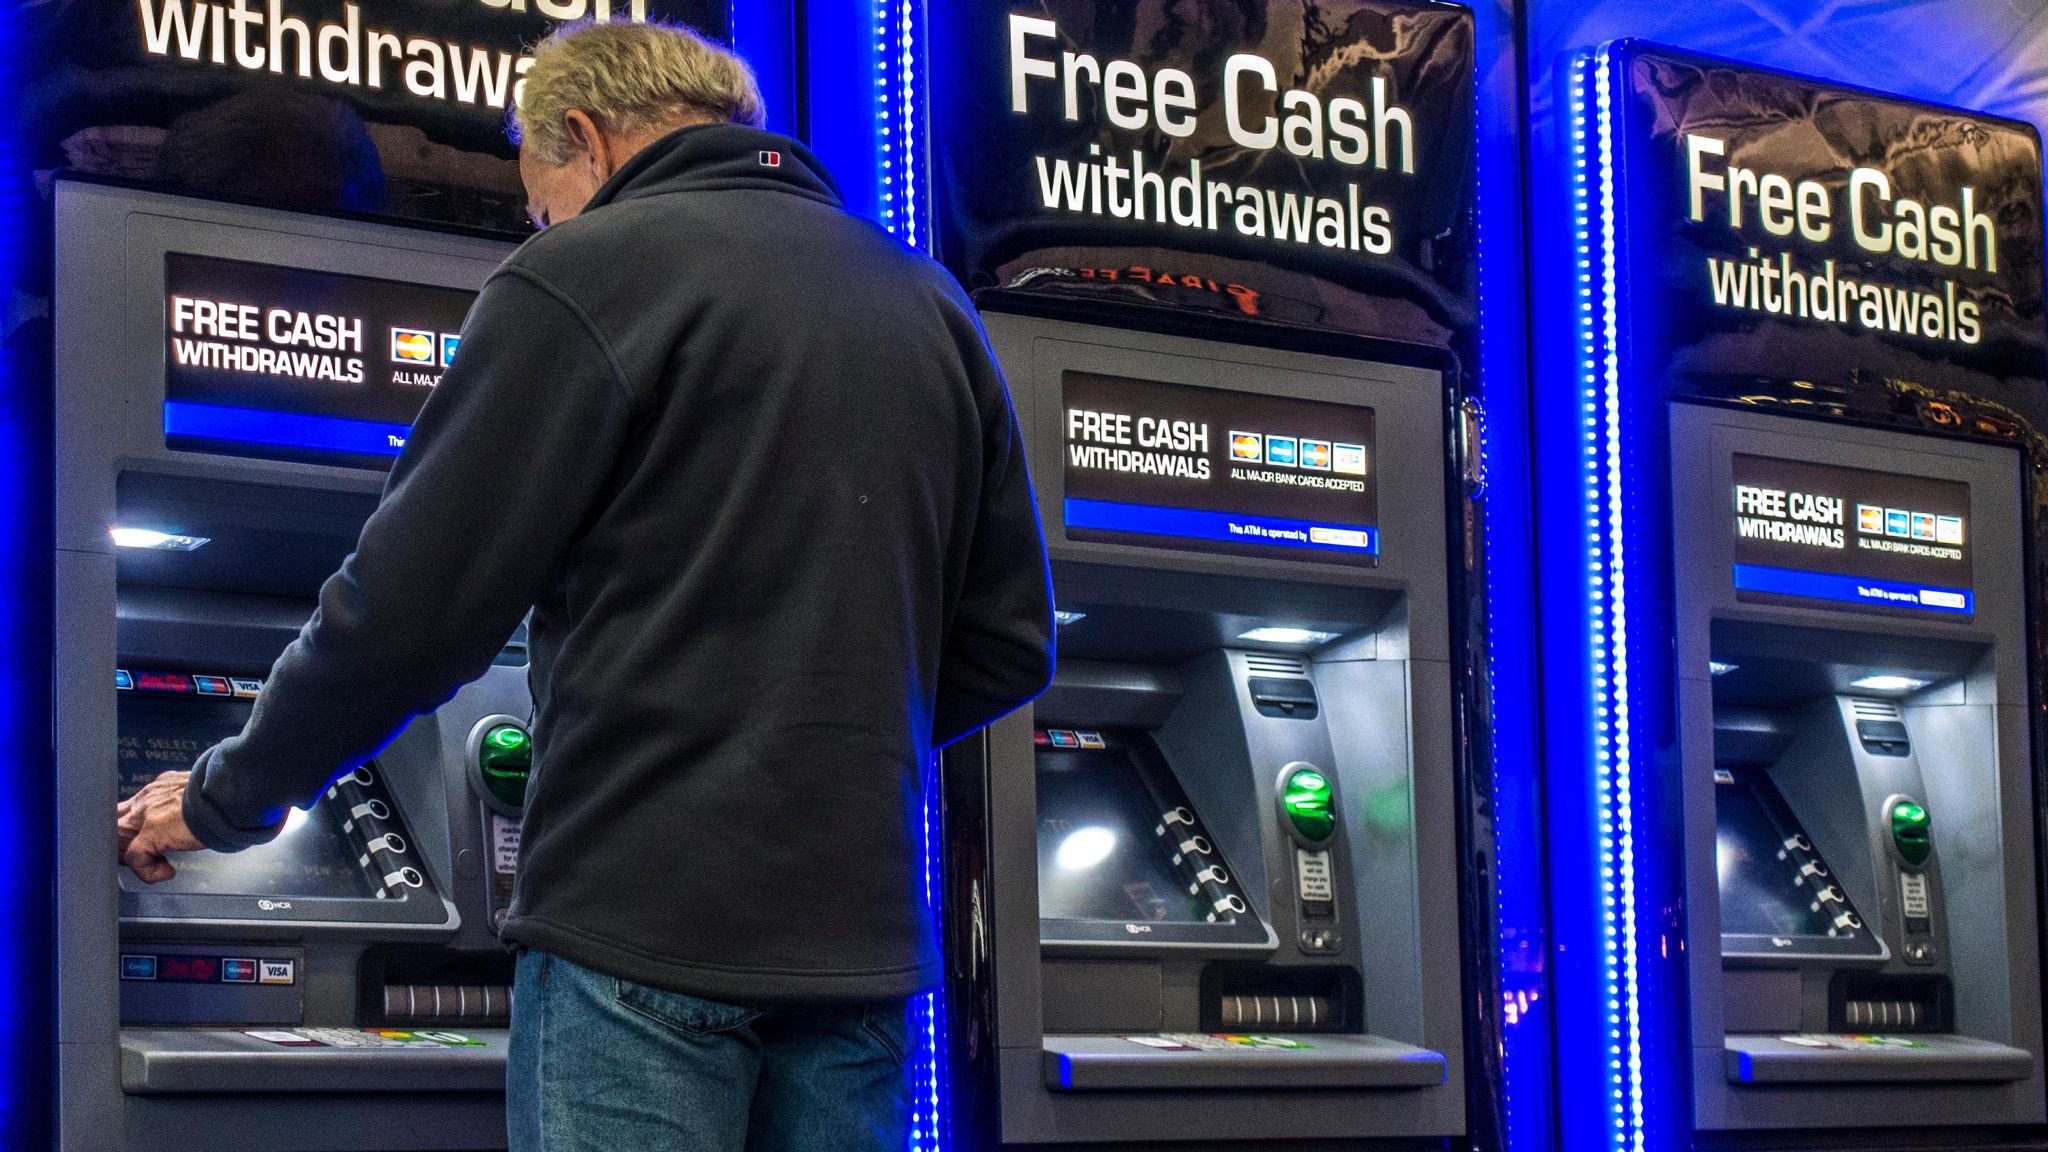 Cash machine operator threatens legal action against ATM